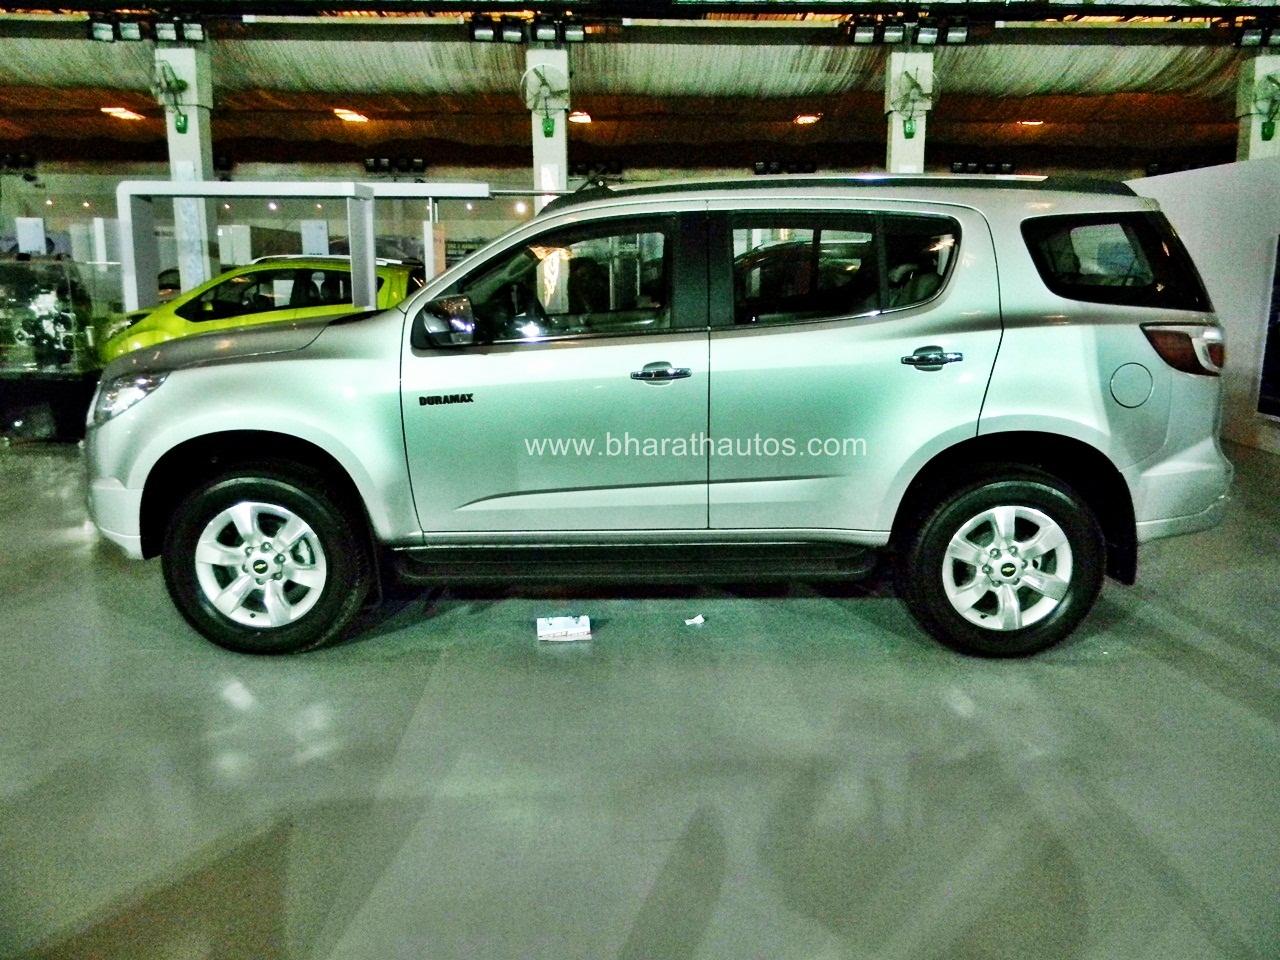 Chevrolet Trailblazer arriving in India tomorrow